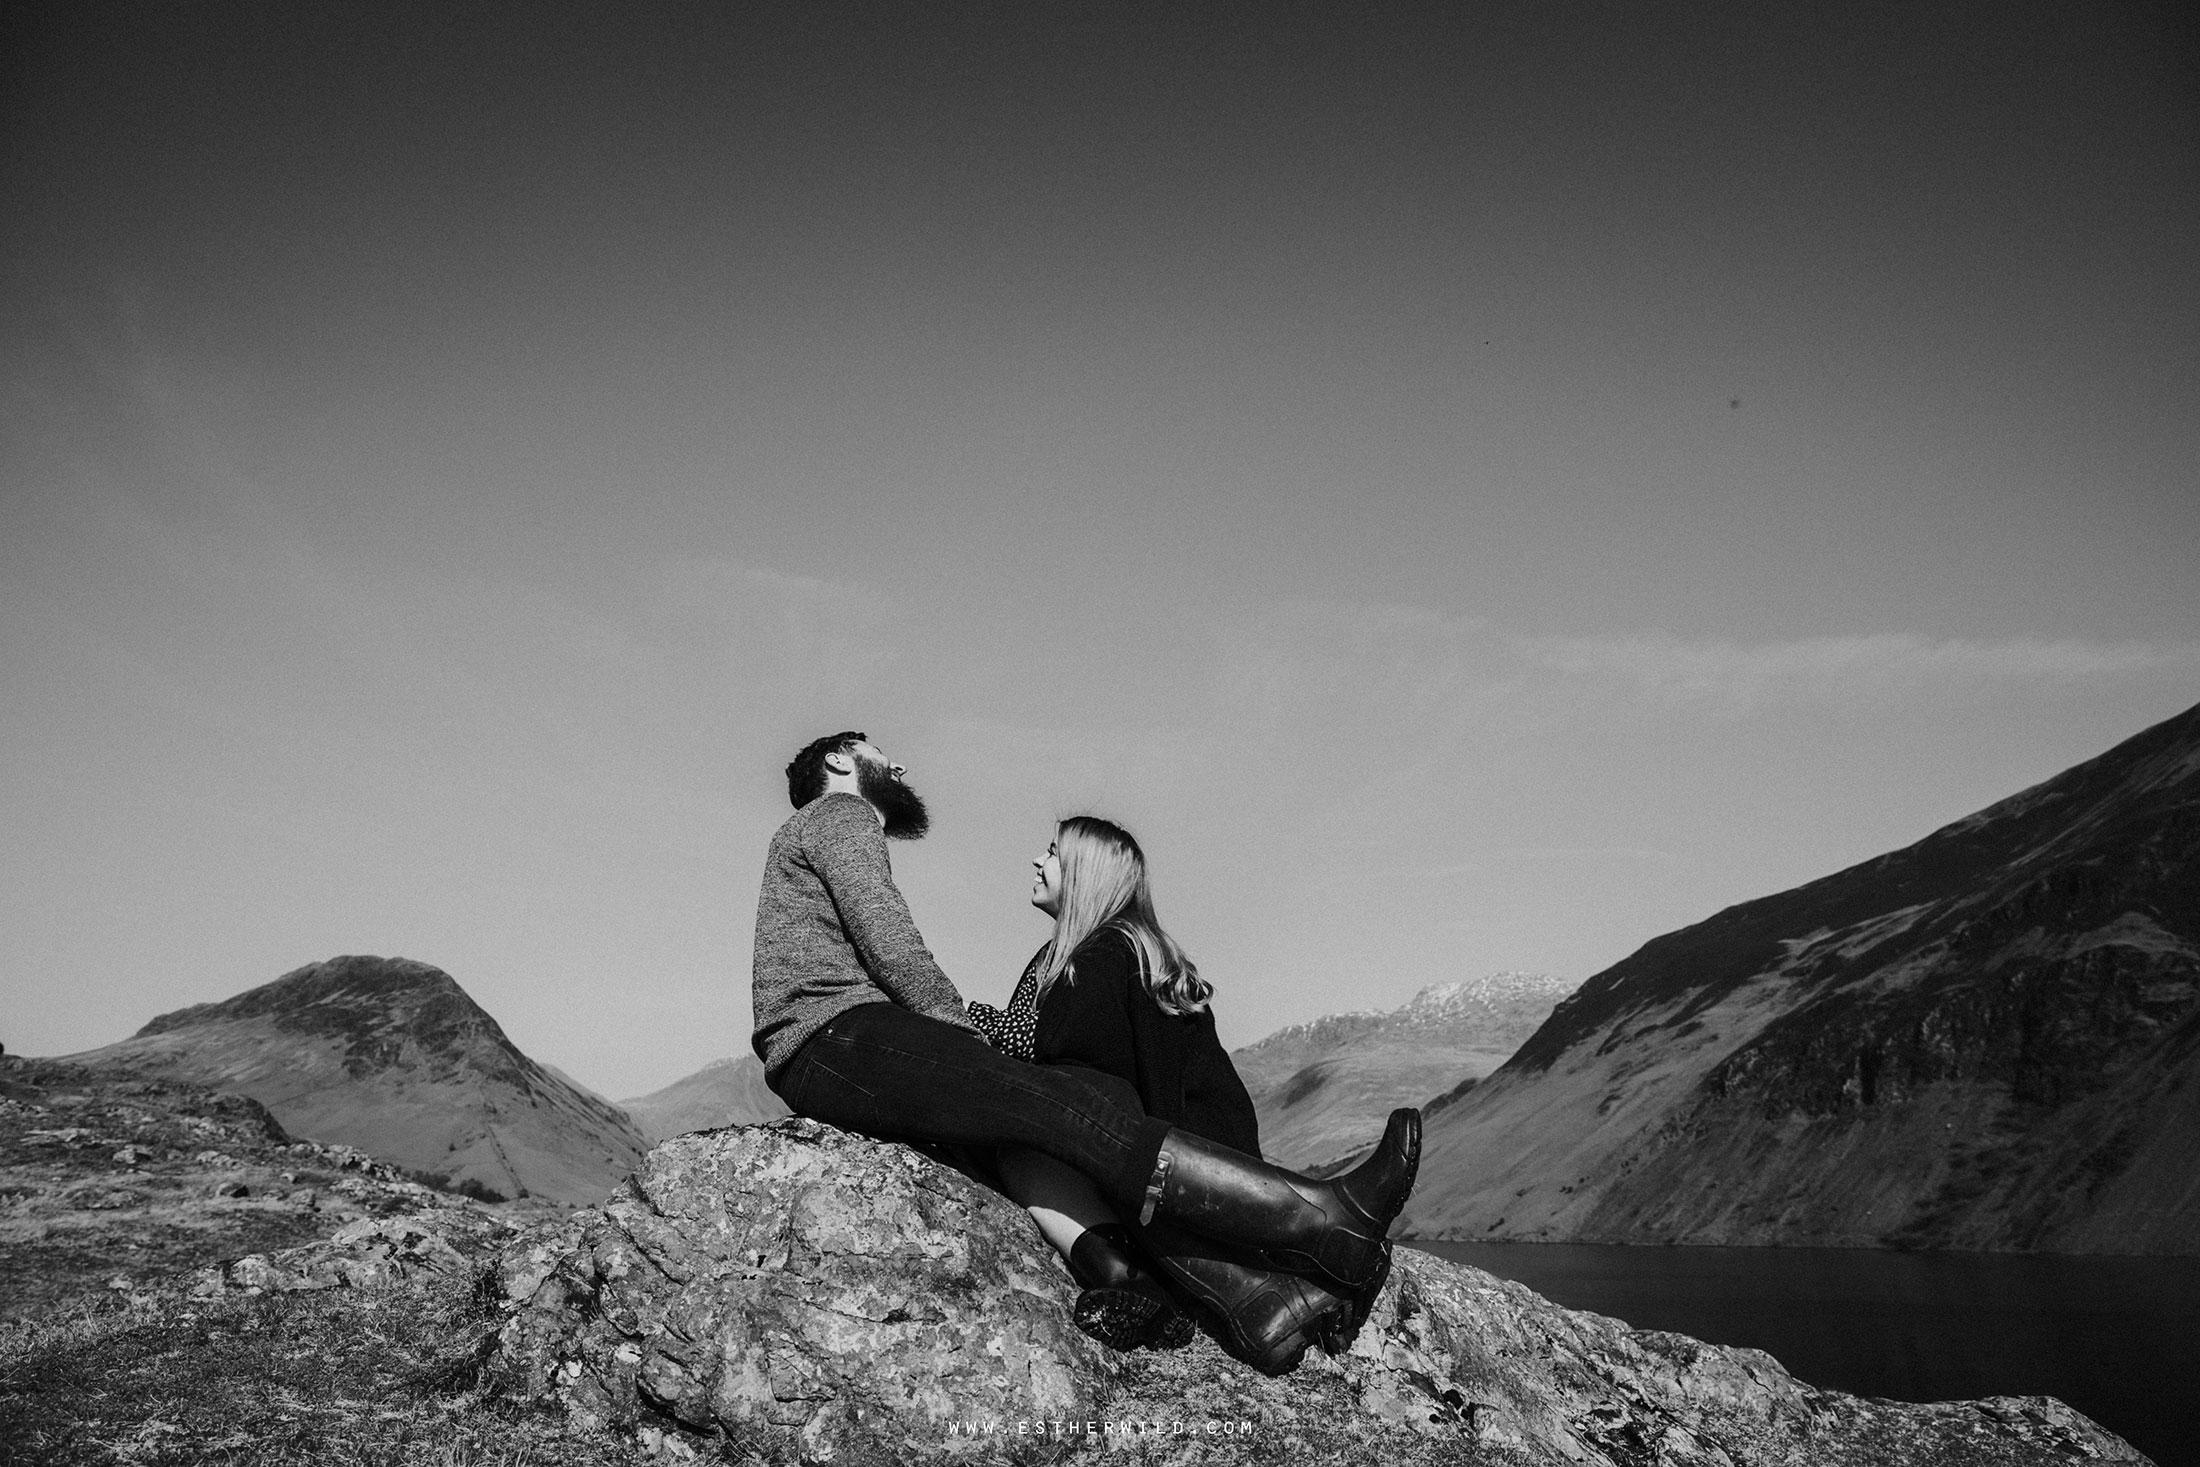 Cumbria_Lake_District_Wasdale_Wedding_Photographer_Destination_Engagement_Anniversary_Esther_Wild_IMG_3397-2.jpg